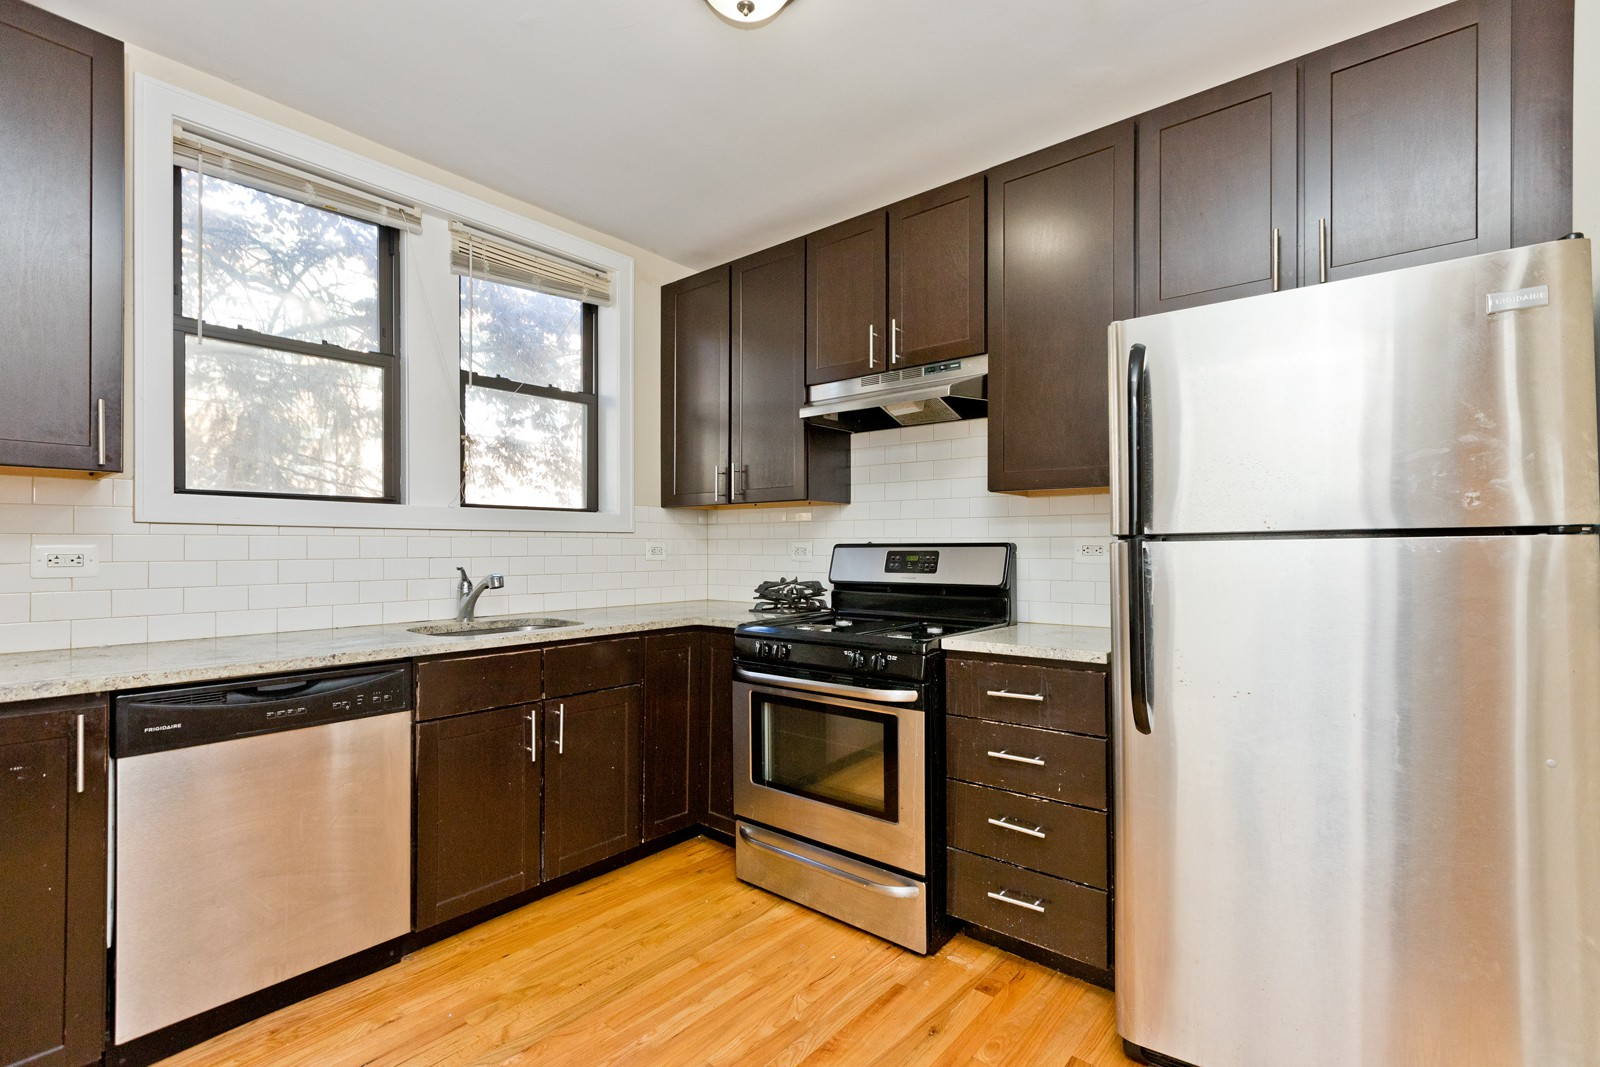 2613-19 W. Berwyn for rent